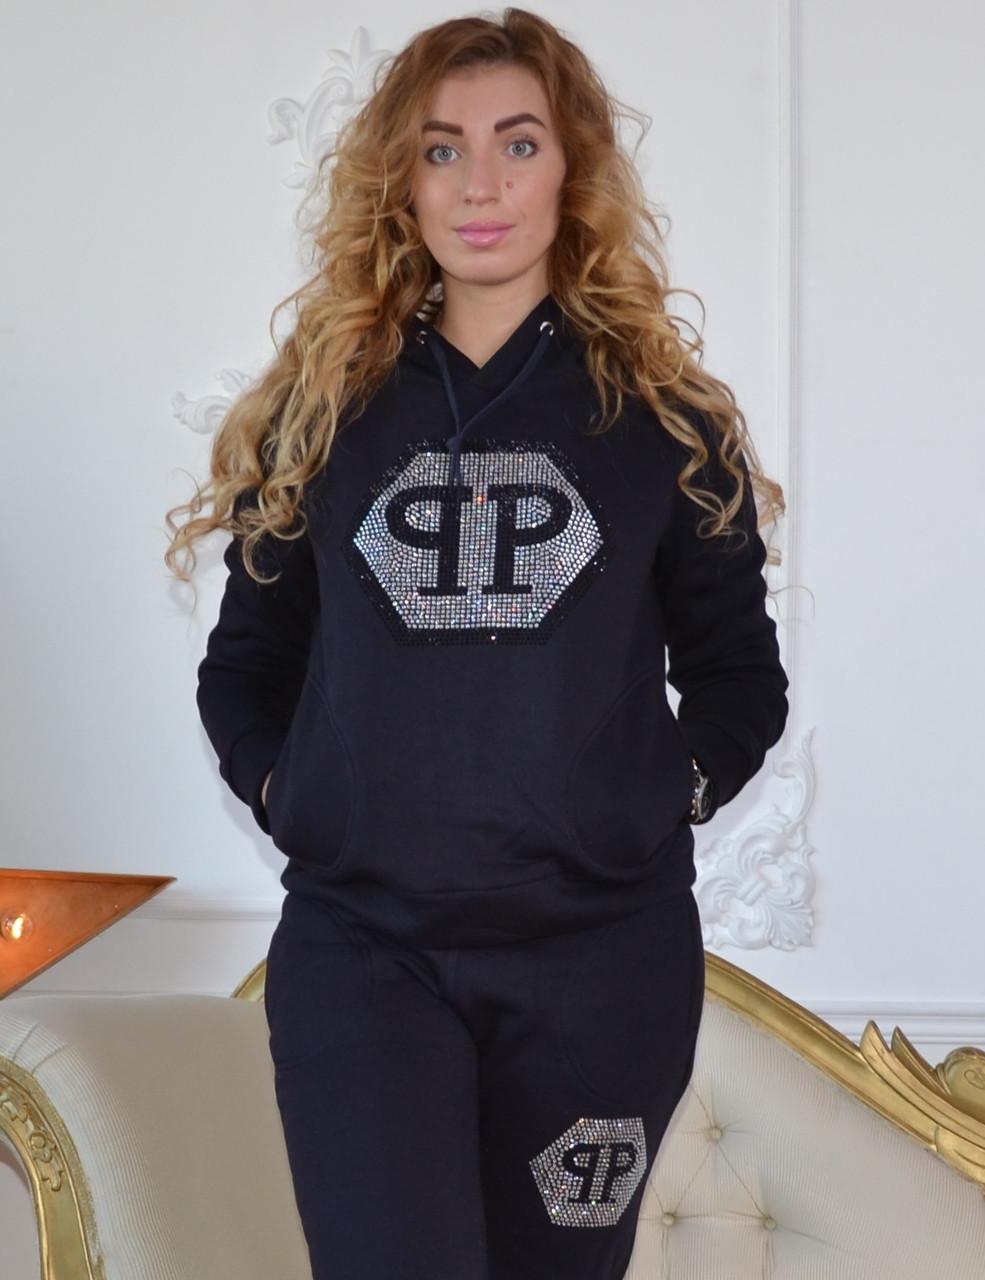 Женский турецкий спортивный костюм из трикотажа на флисе,  разм 42,44,46,48